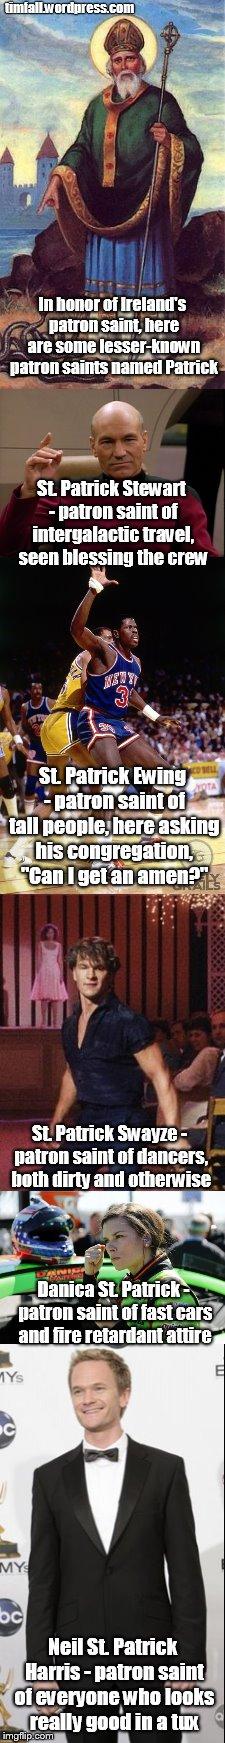 lesser known Patricks